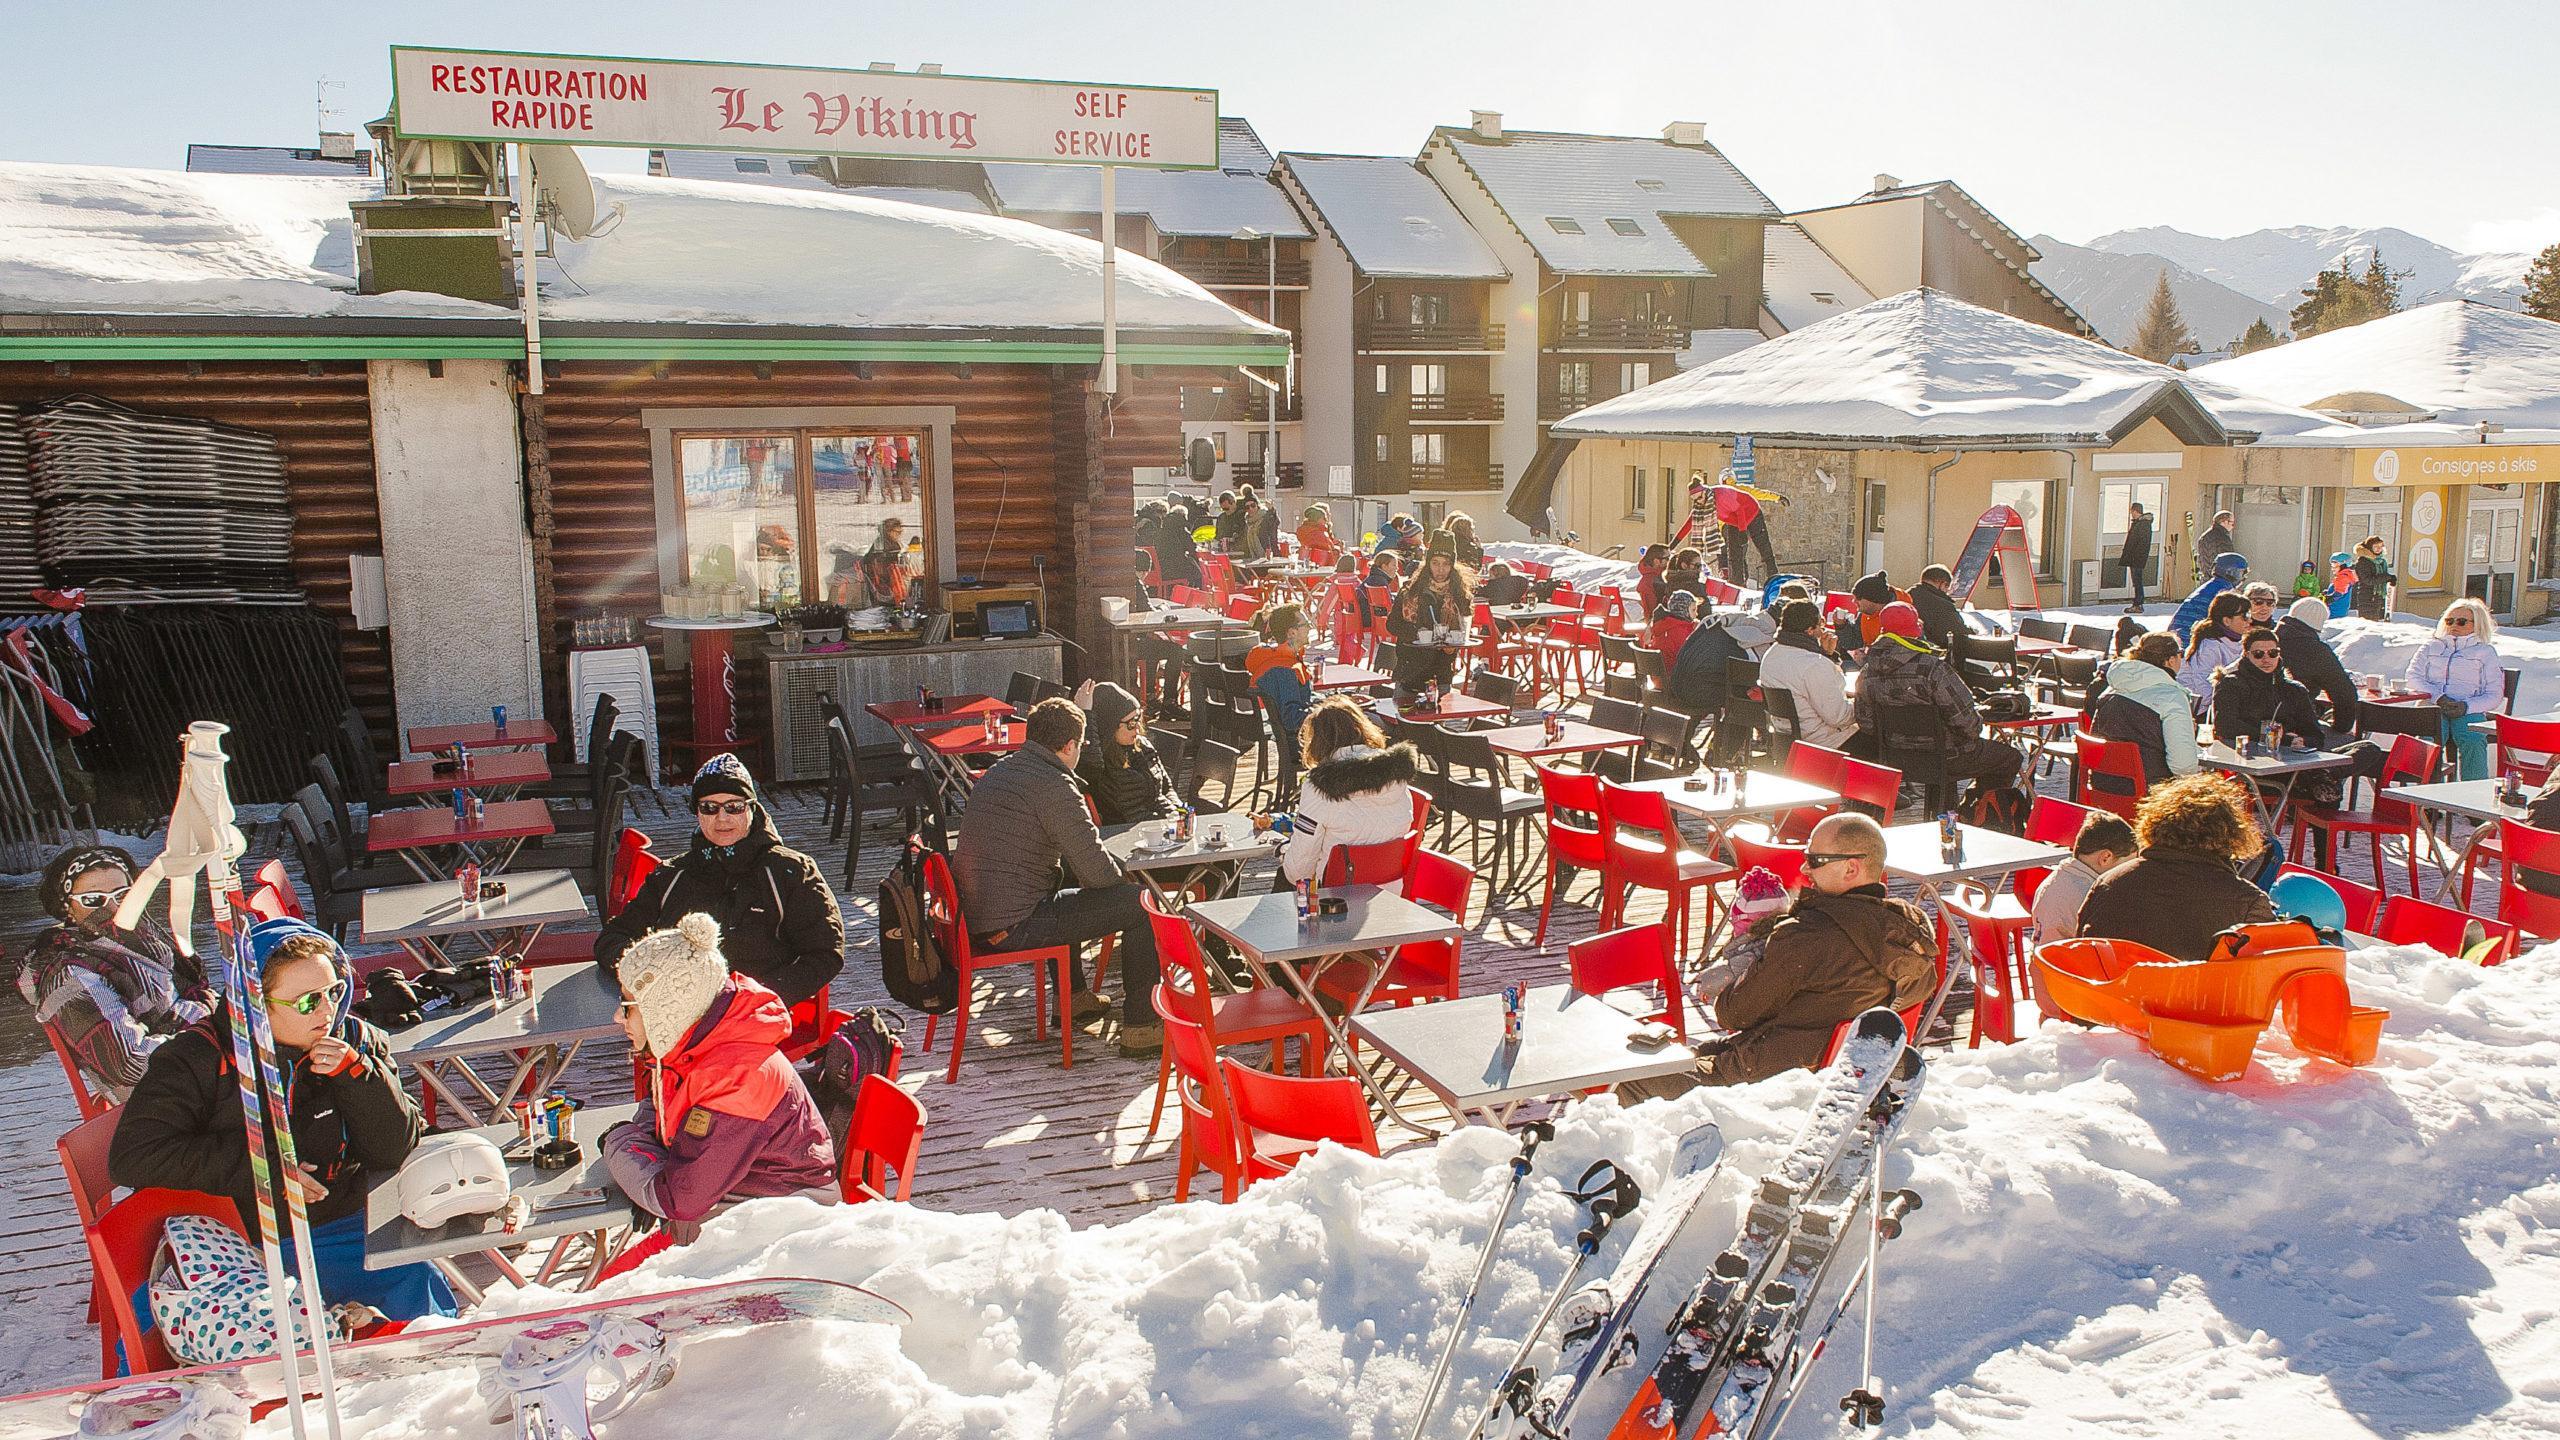 Pyrénées-Orientales: Le Viking - ein einfaches Lokal an der Talstation von Bolquère. Foto: Hilke Maunder